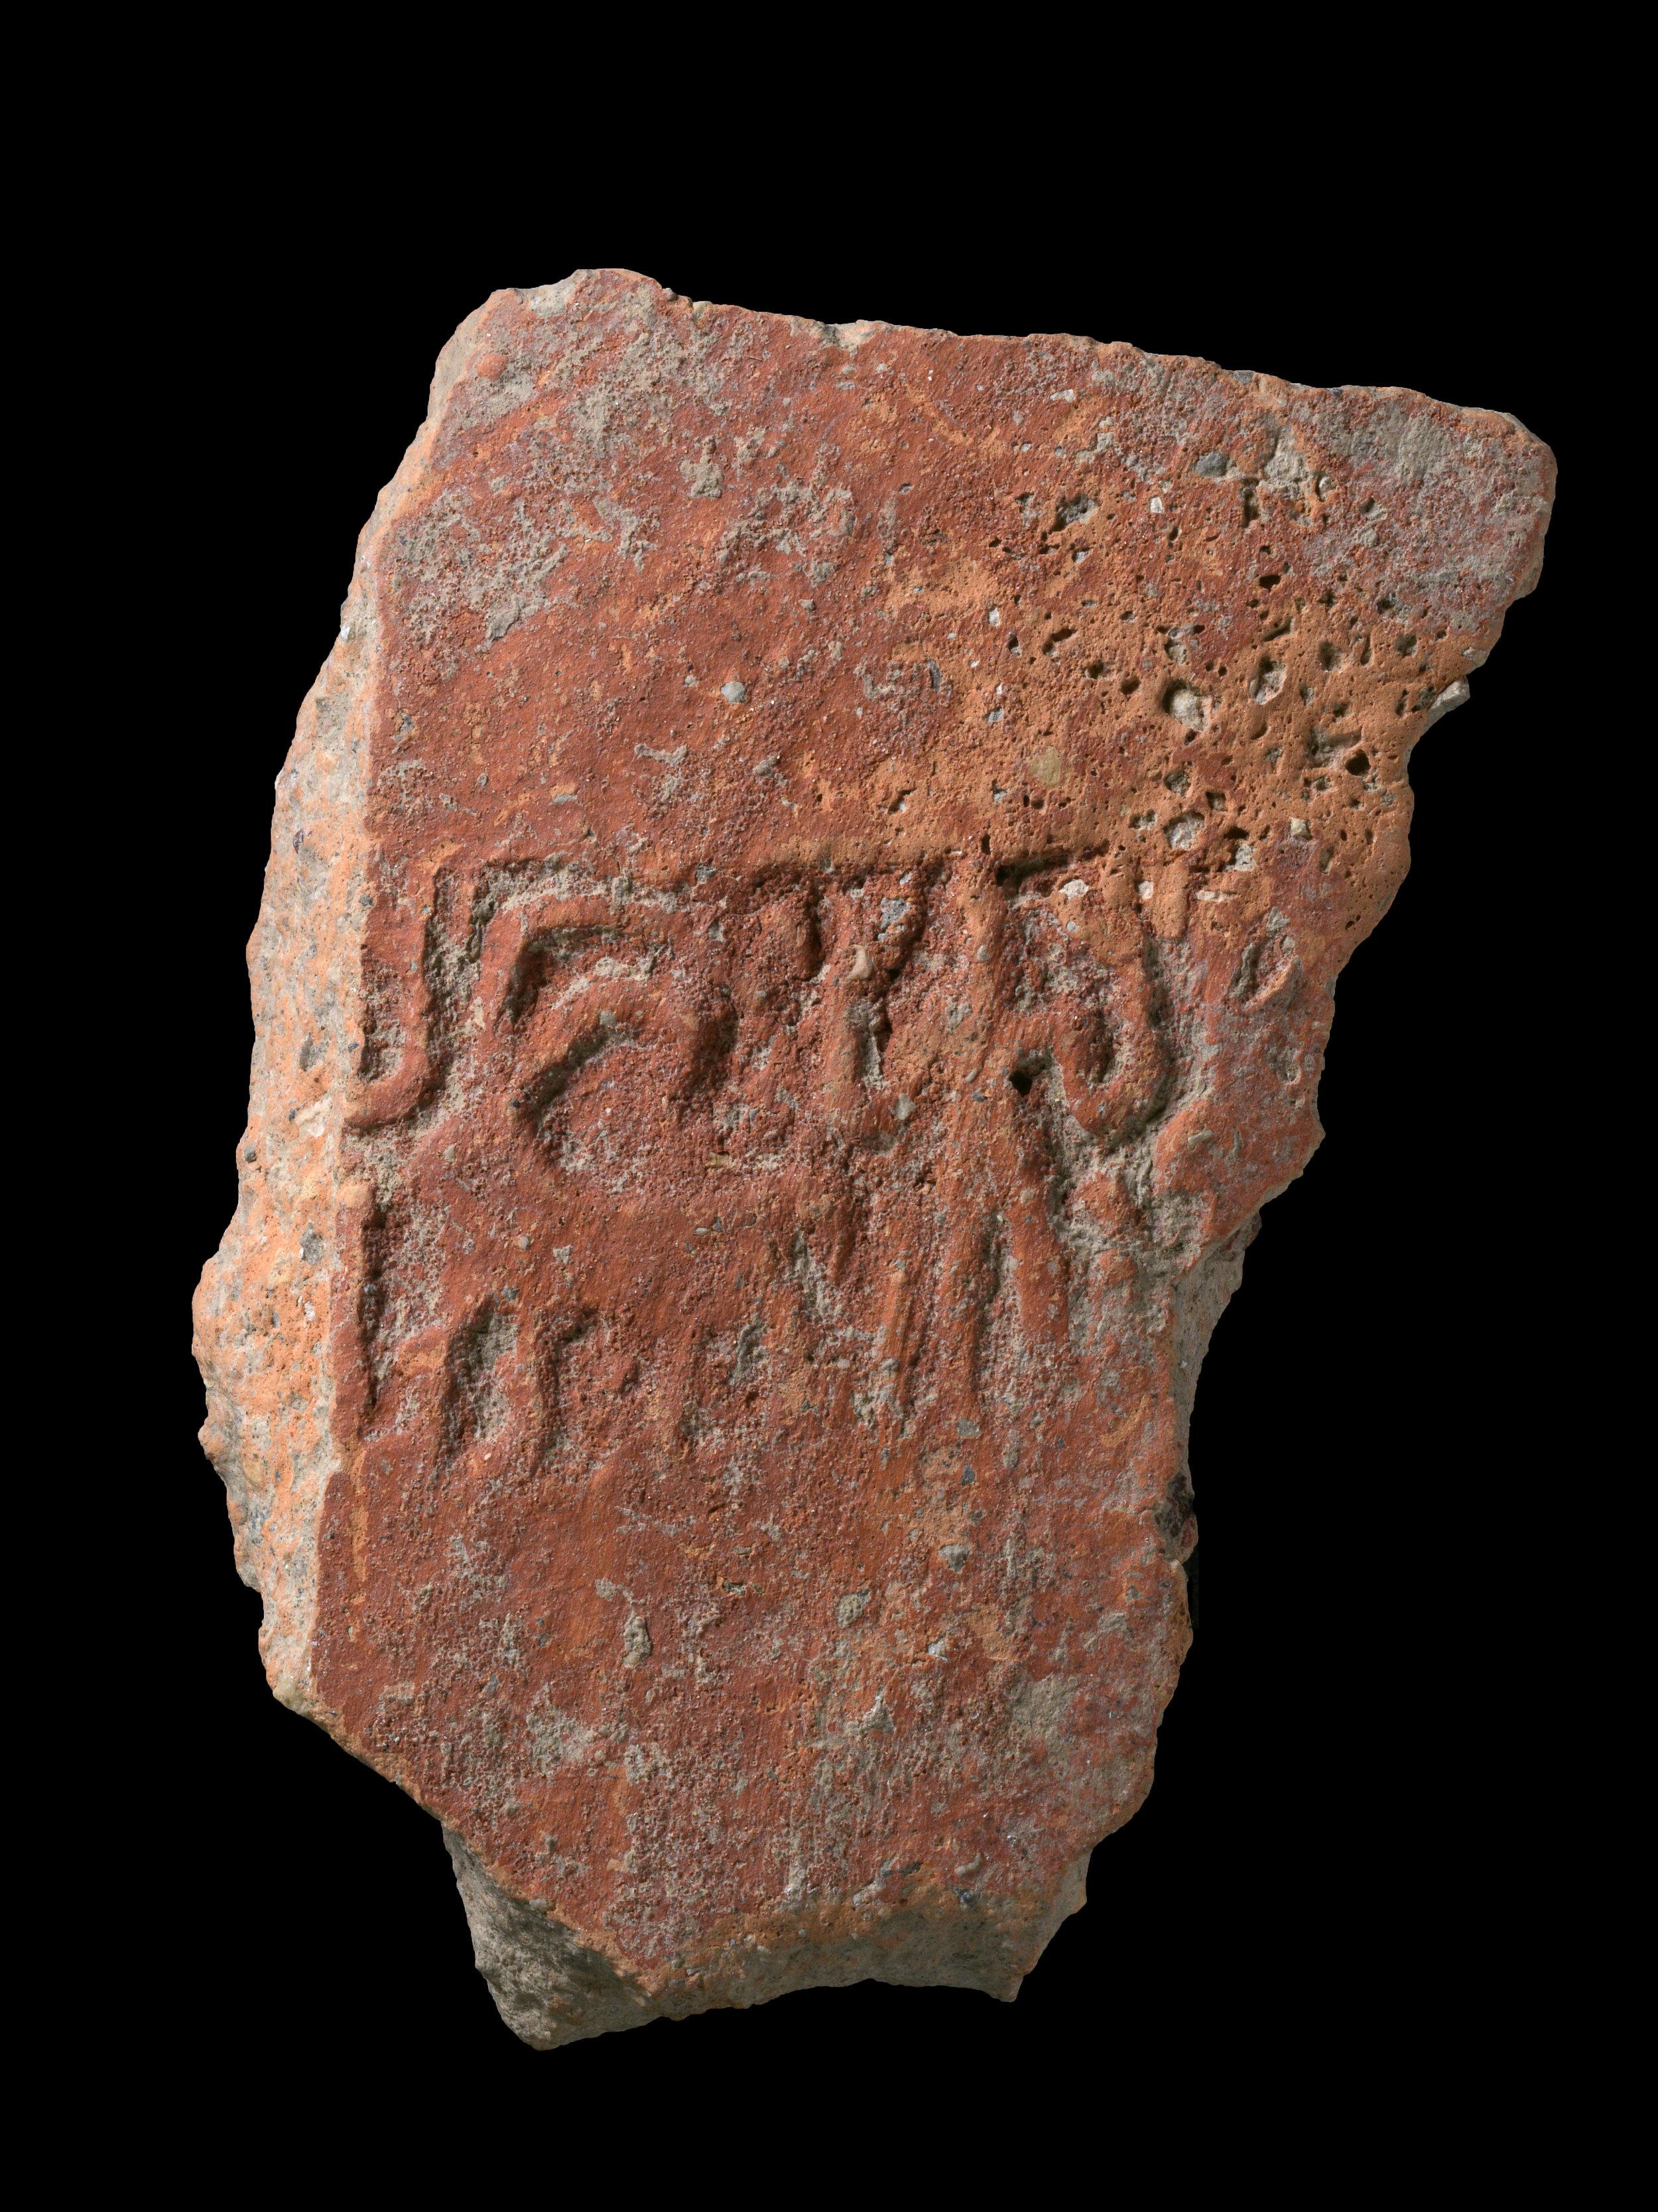 Photo: Yoli Schwartz, courtesy of the  Israel Antiquities Authority